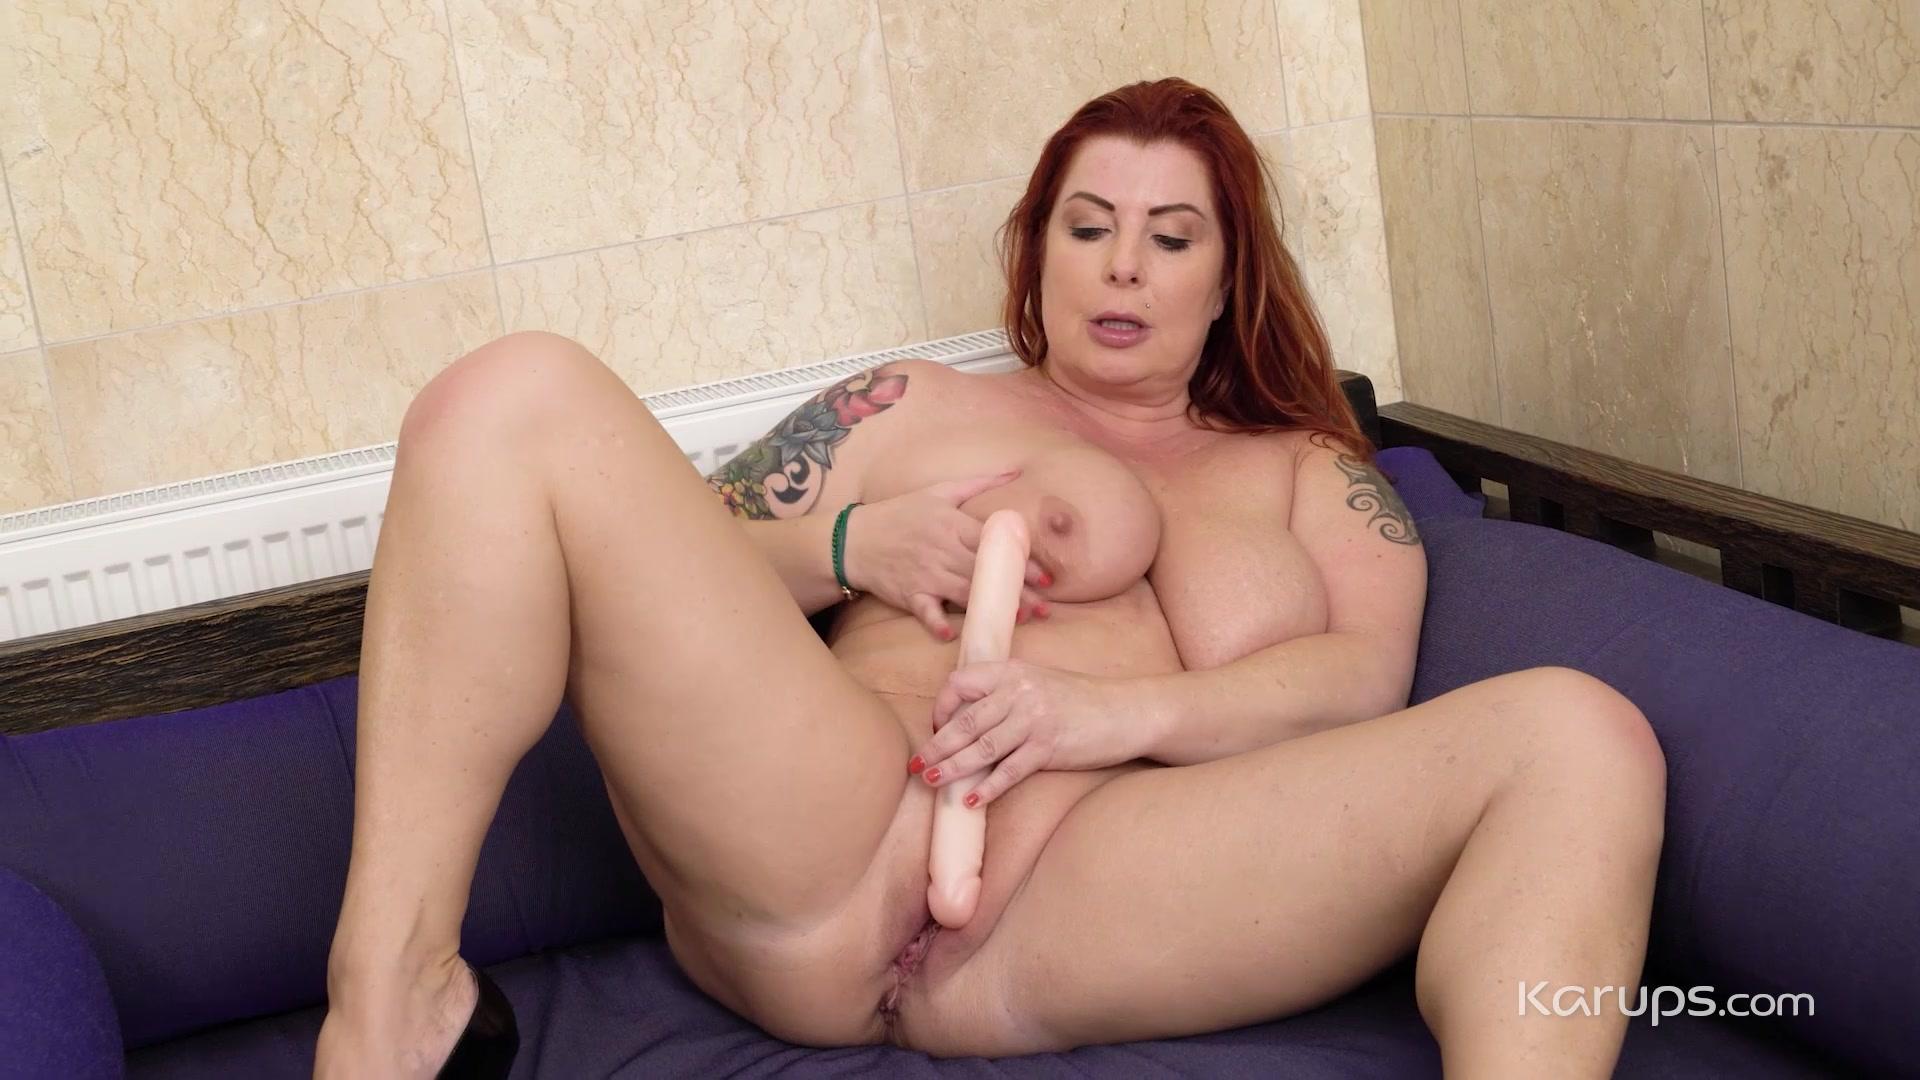 Video 1456452904: big tits sucking dildo, big natural tits dildo, curvy milf plays, milf loves playing, very busty